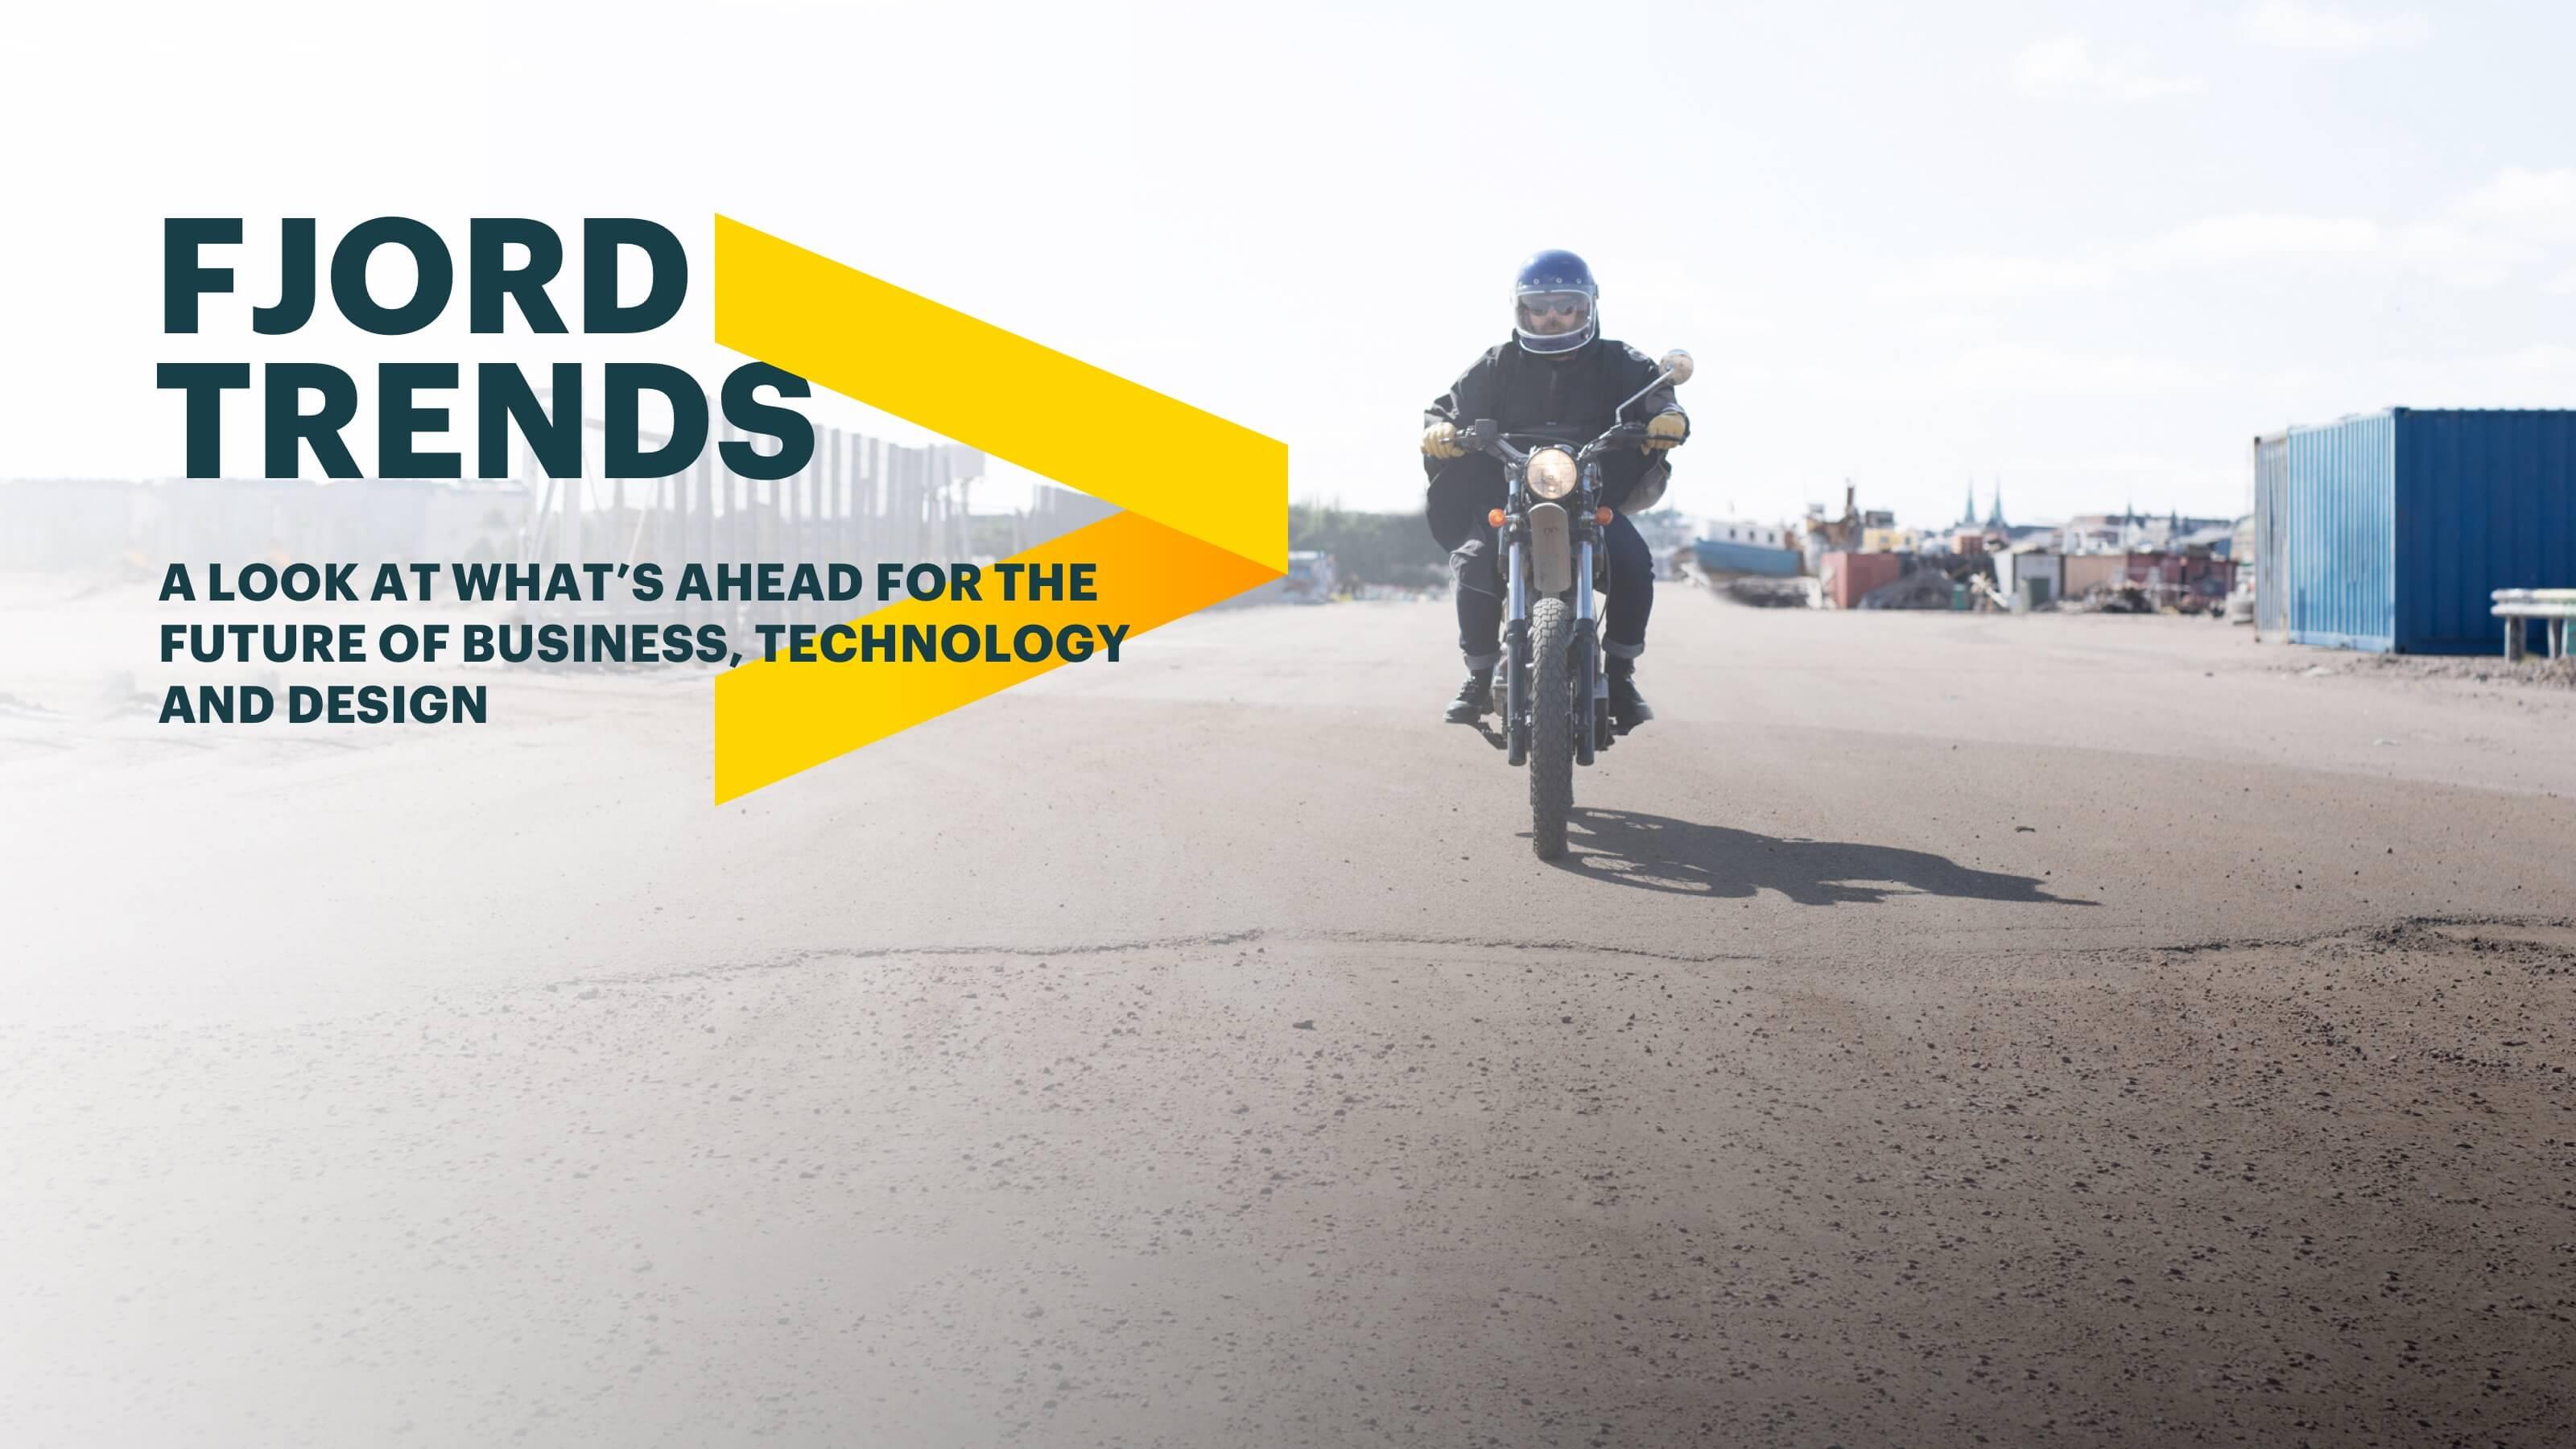 Fjord Trends 2018 Report Accenture